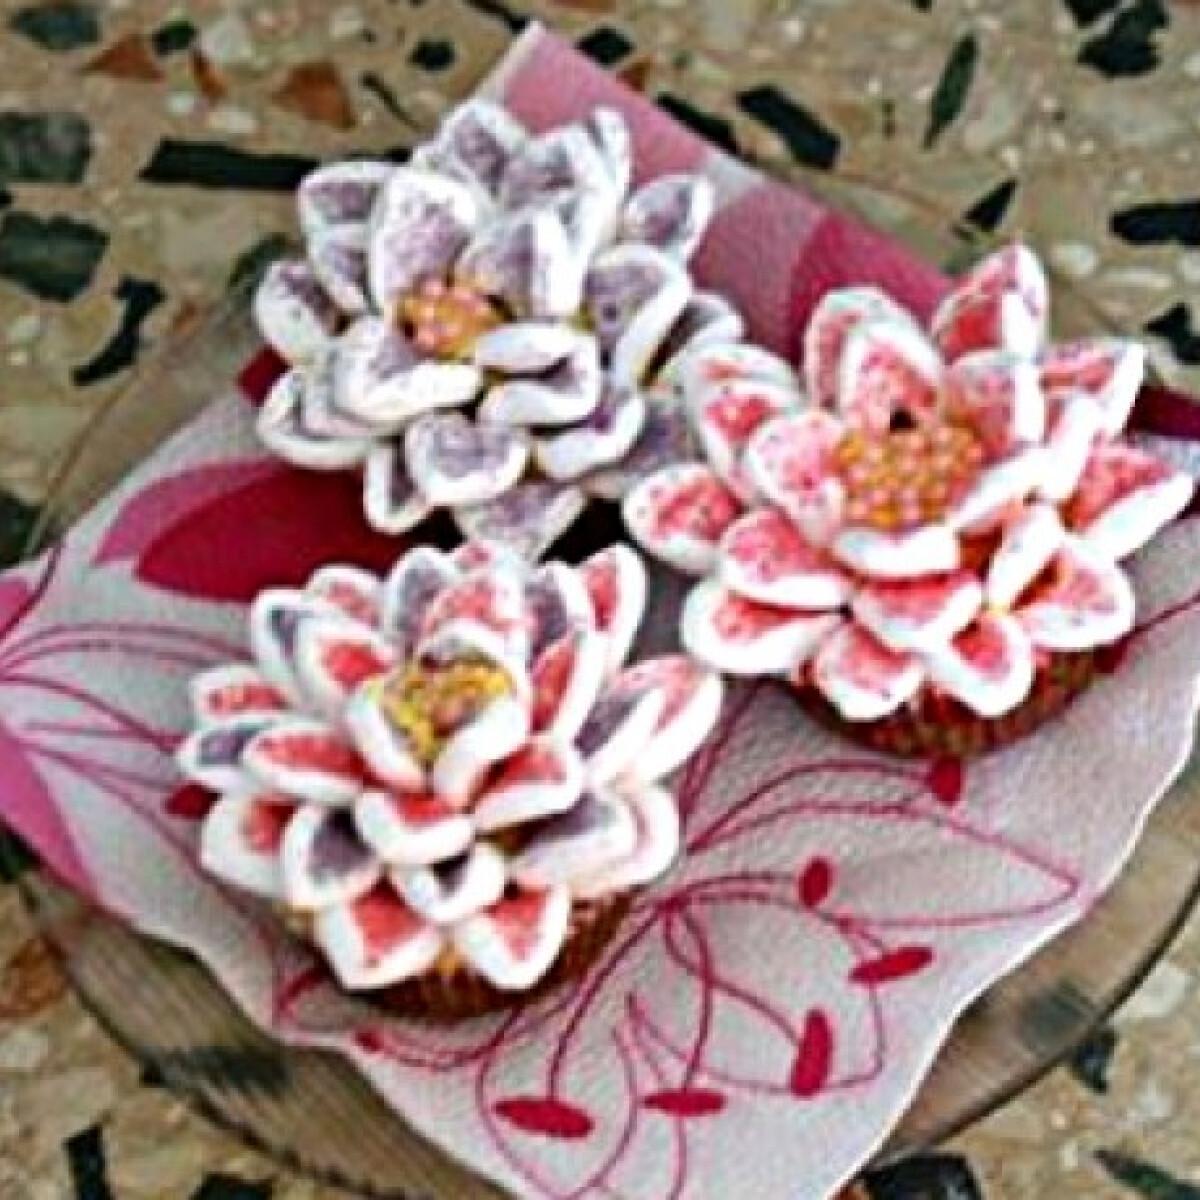 Ezen a képen: Cupcake virág